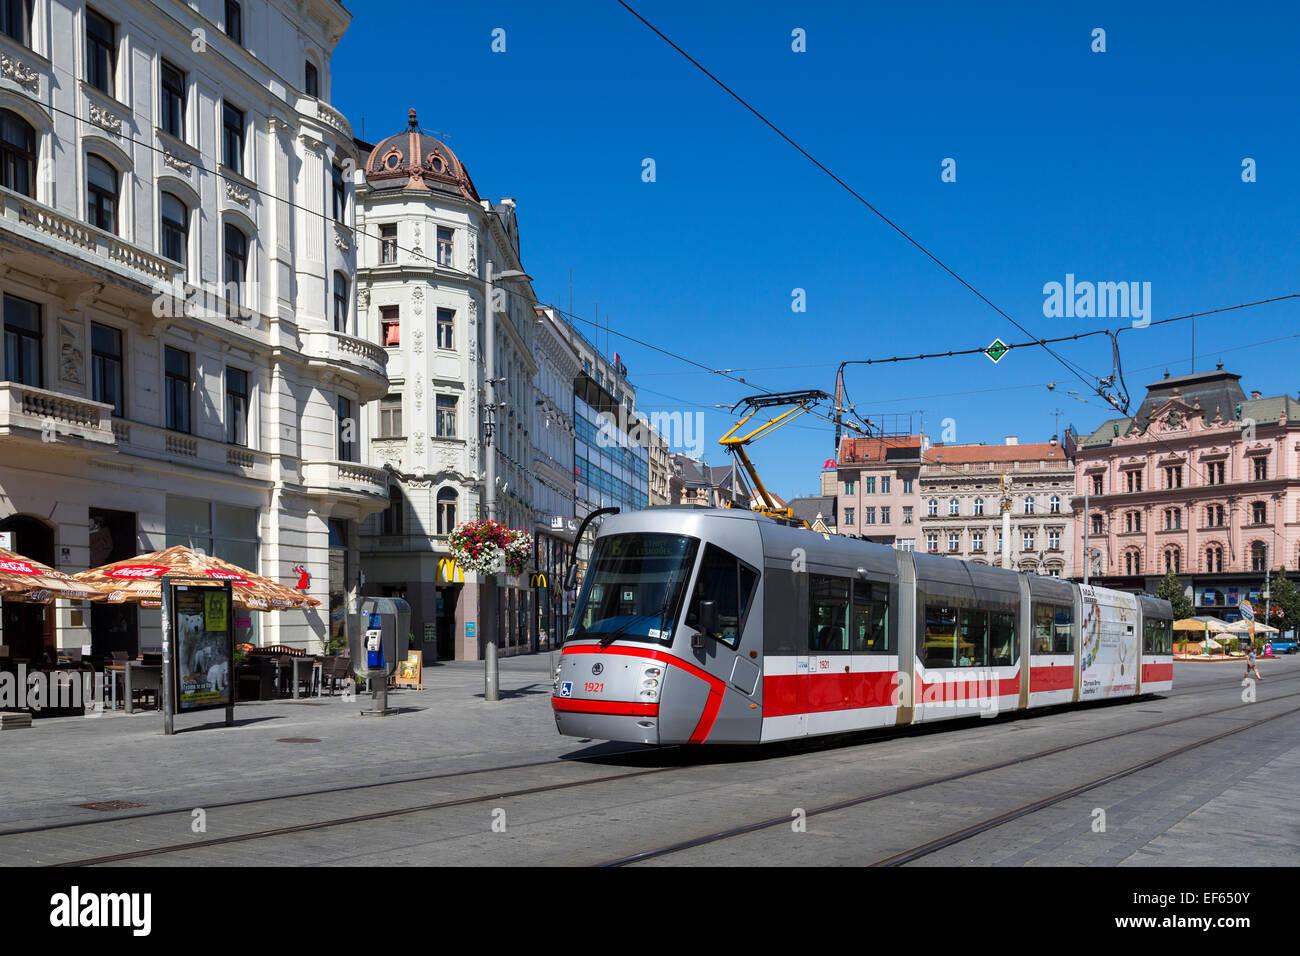 Public transport tram, Brno, Czech Republic, Europe - Stock Image